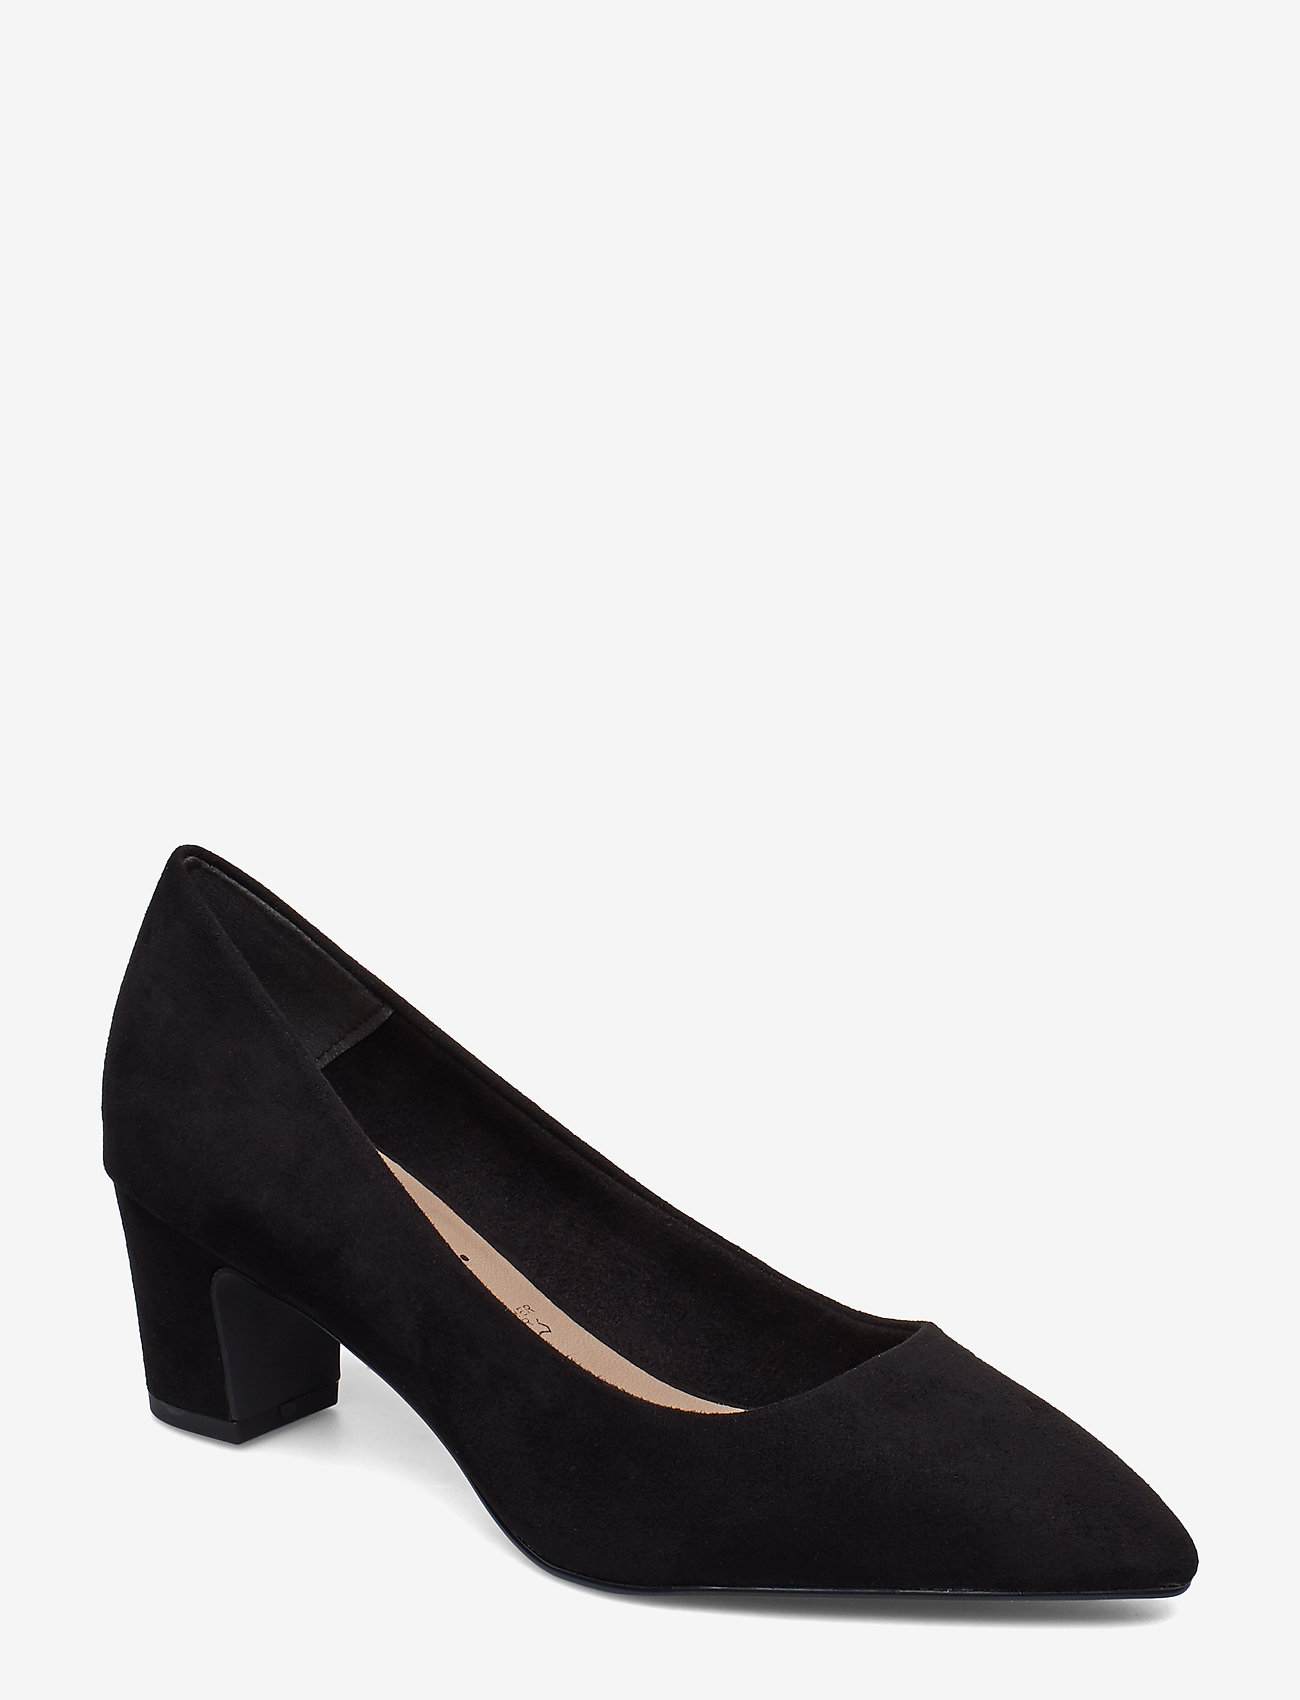 Stilettos TAMARIS 1 22423 22 Black 001 Stilettos